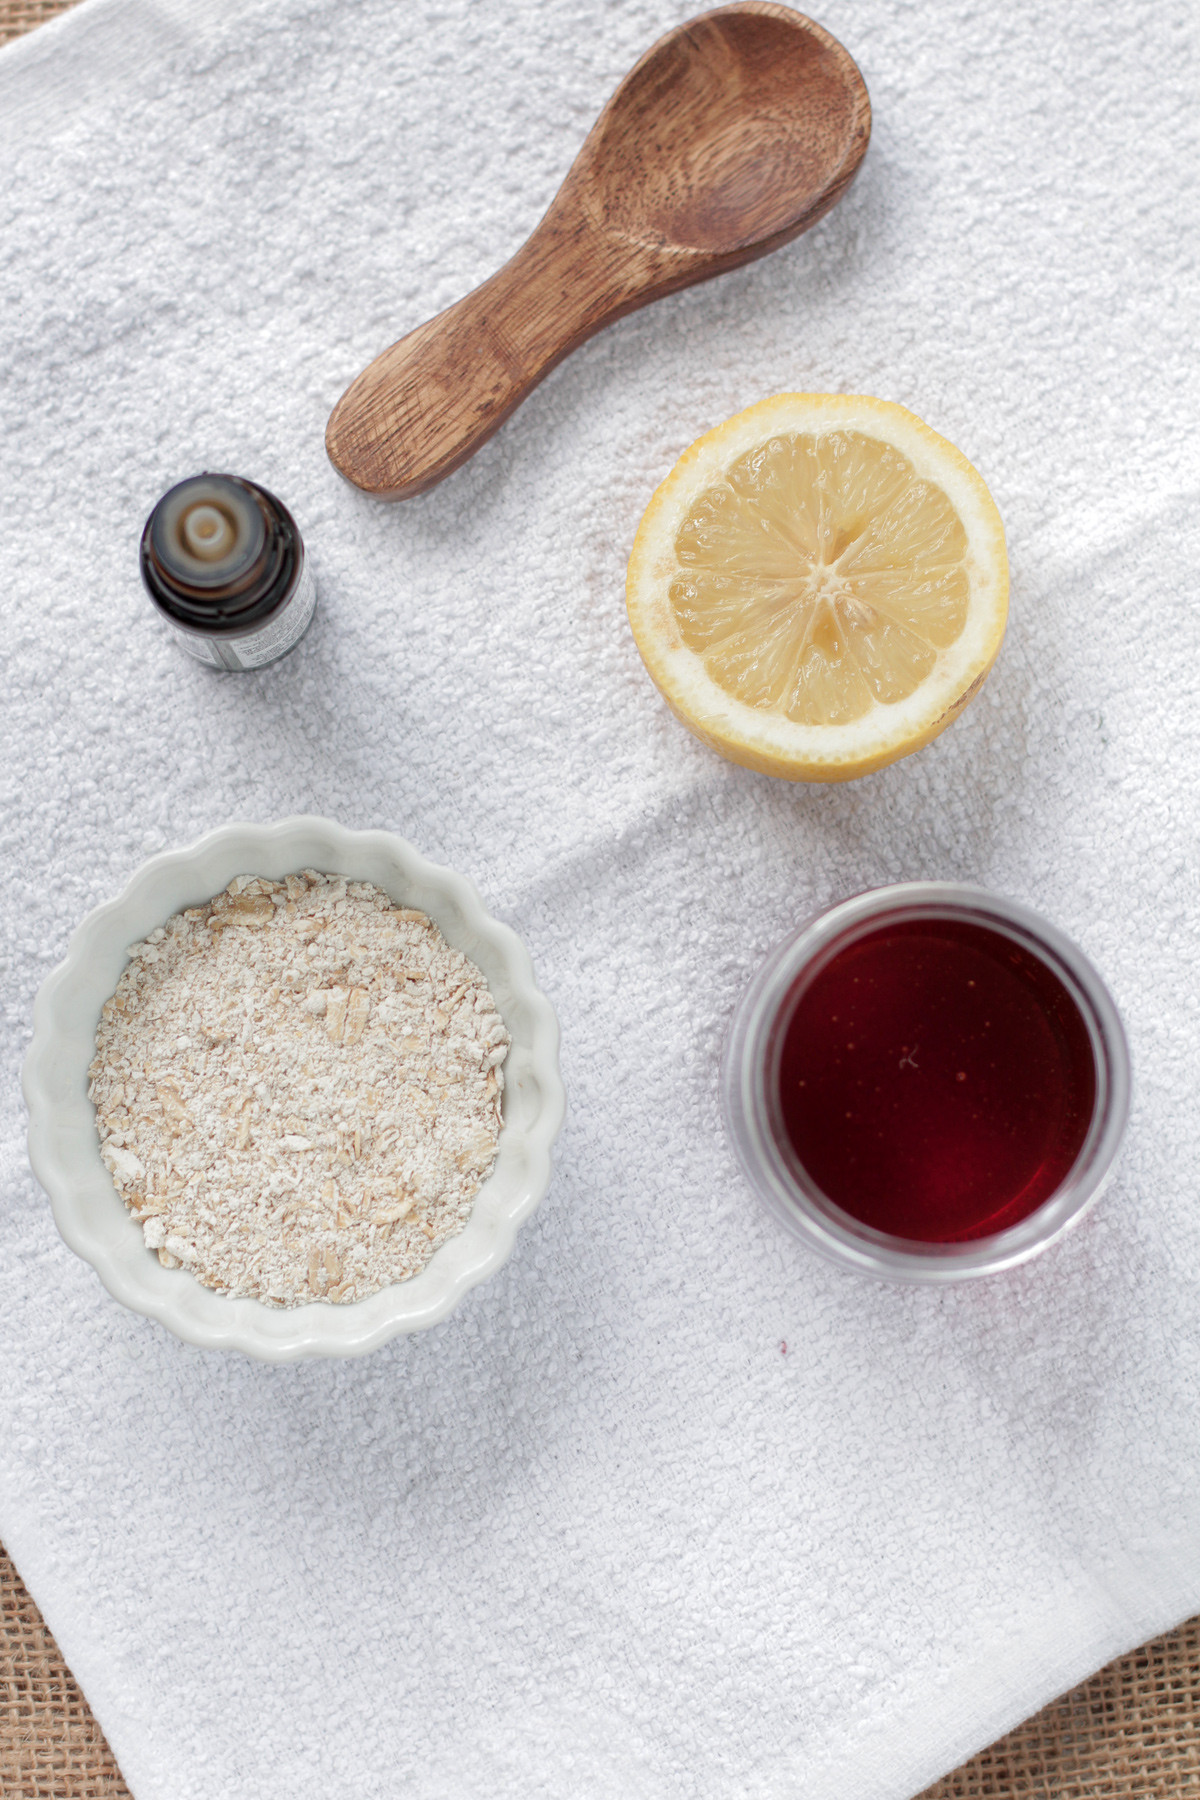 DIY Acne Mask  Homemade Honey Oatmeal Acne Mask Live Simply